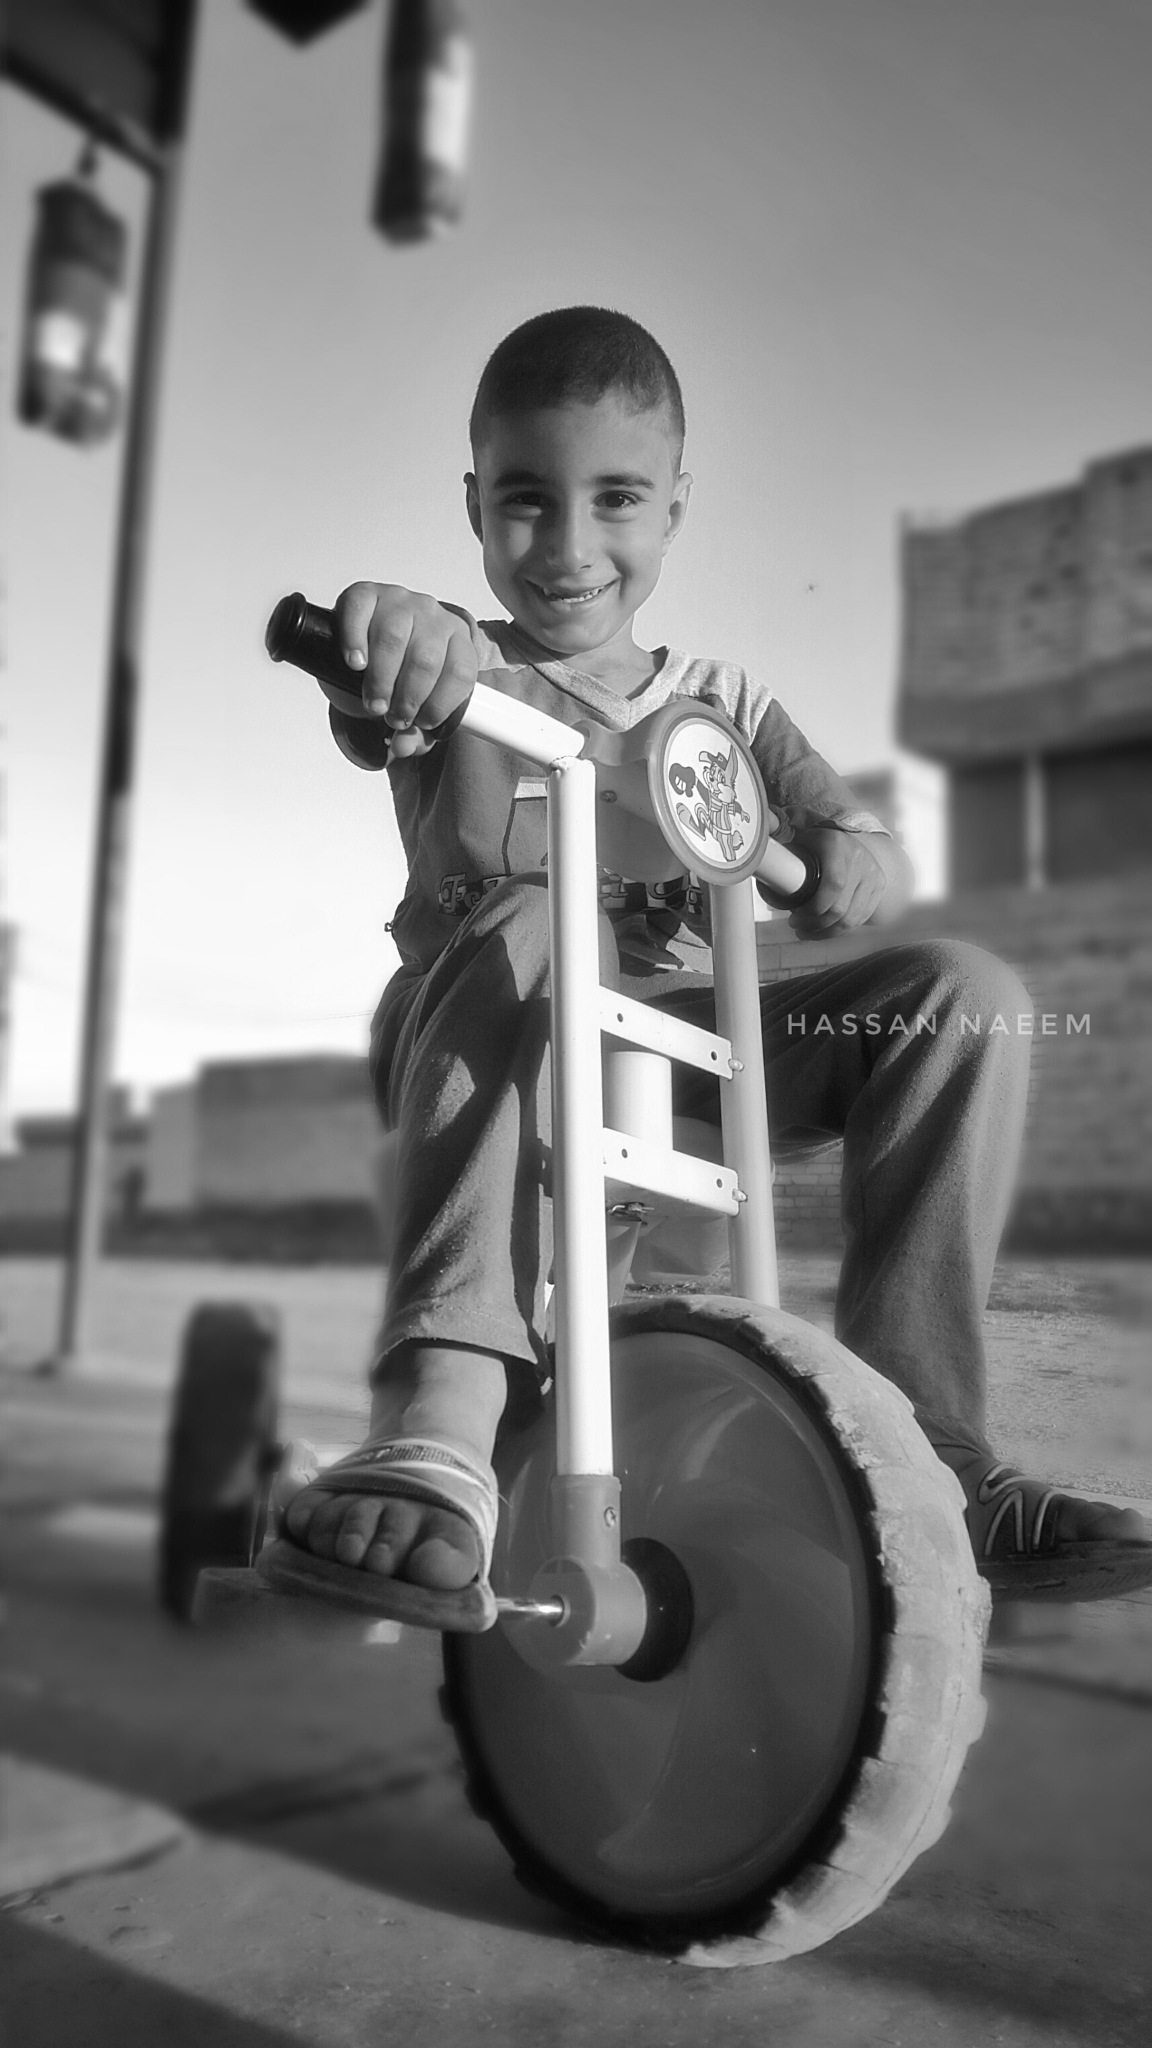 portrait °•°2121 by Hassan Naeem